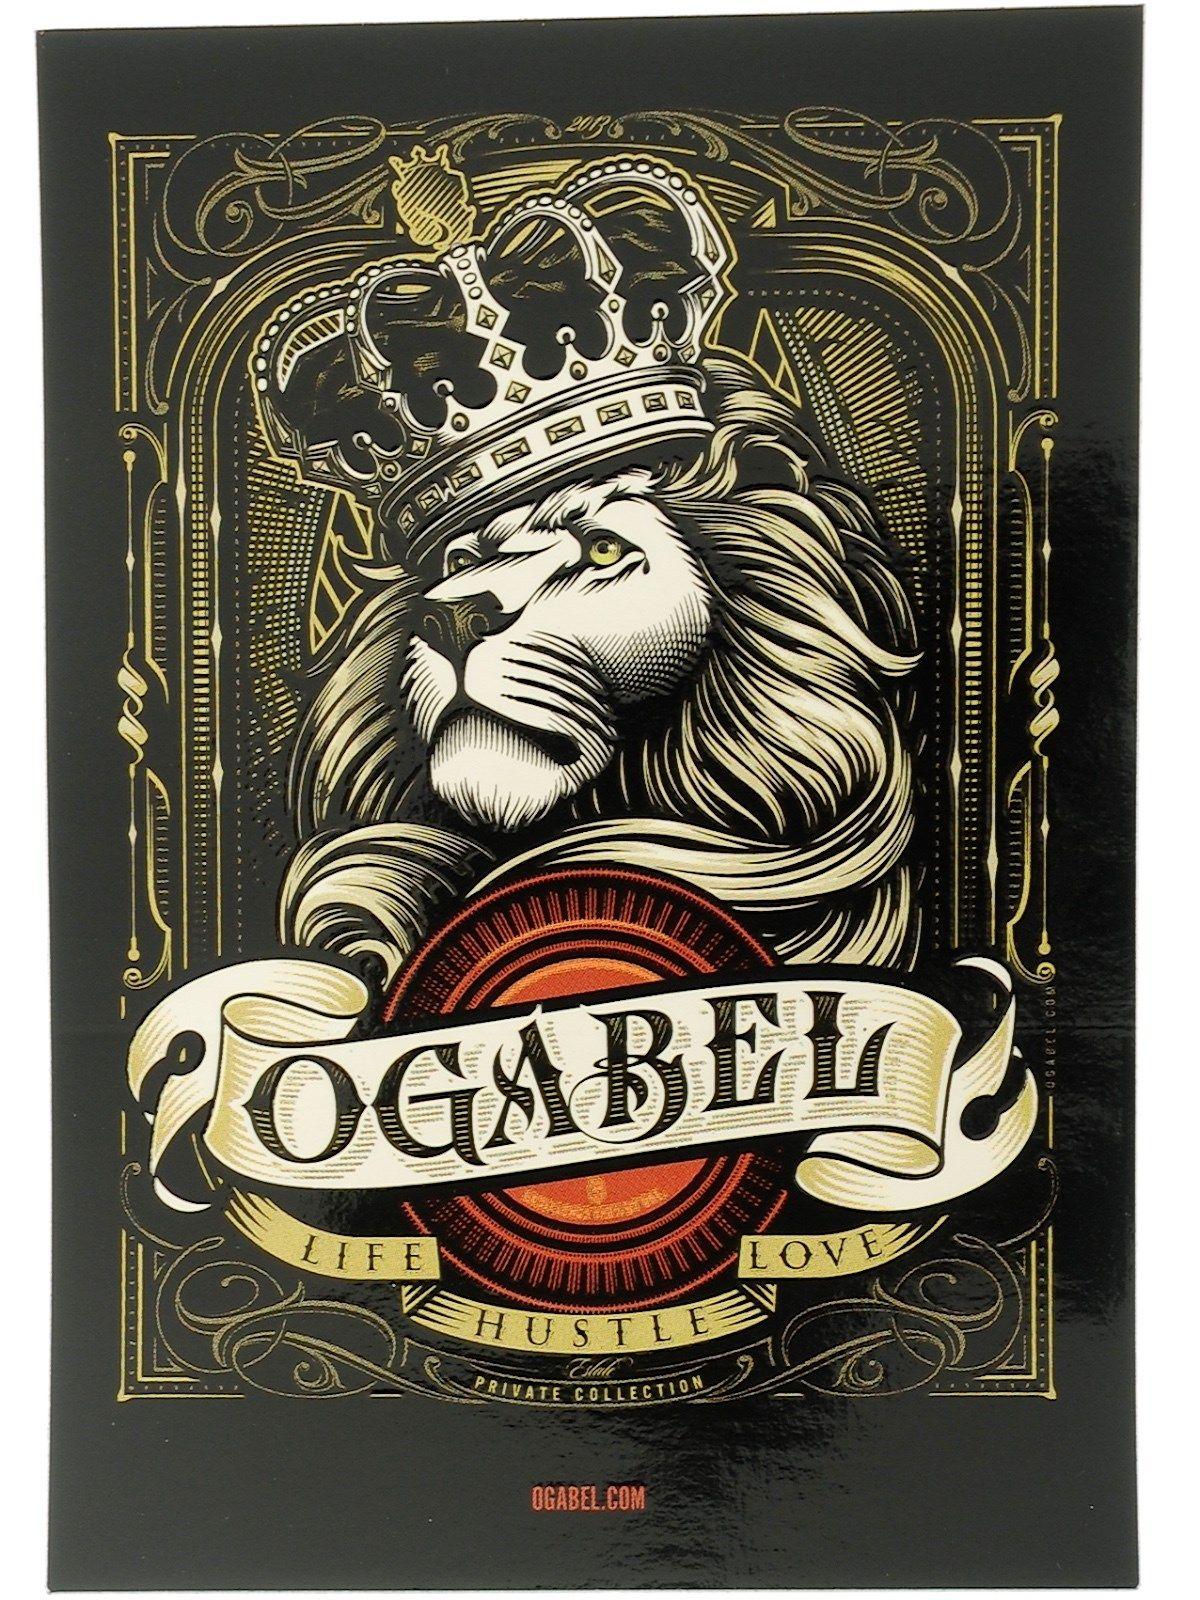 OG-Abel-Black-Variety-11-Sticker-Pack-0-c024a-XL.jpg (1200×1600)